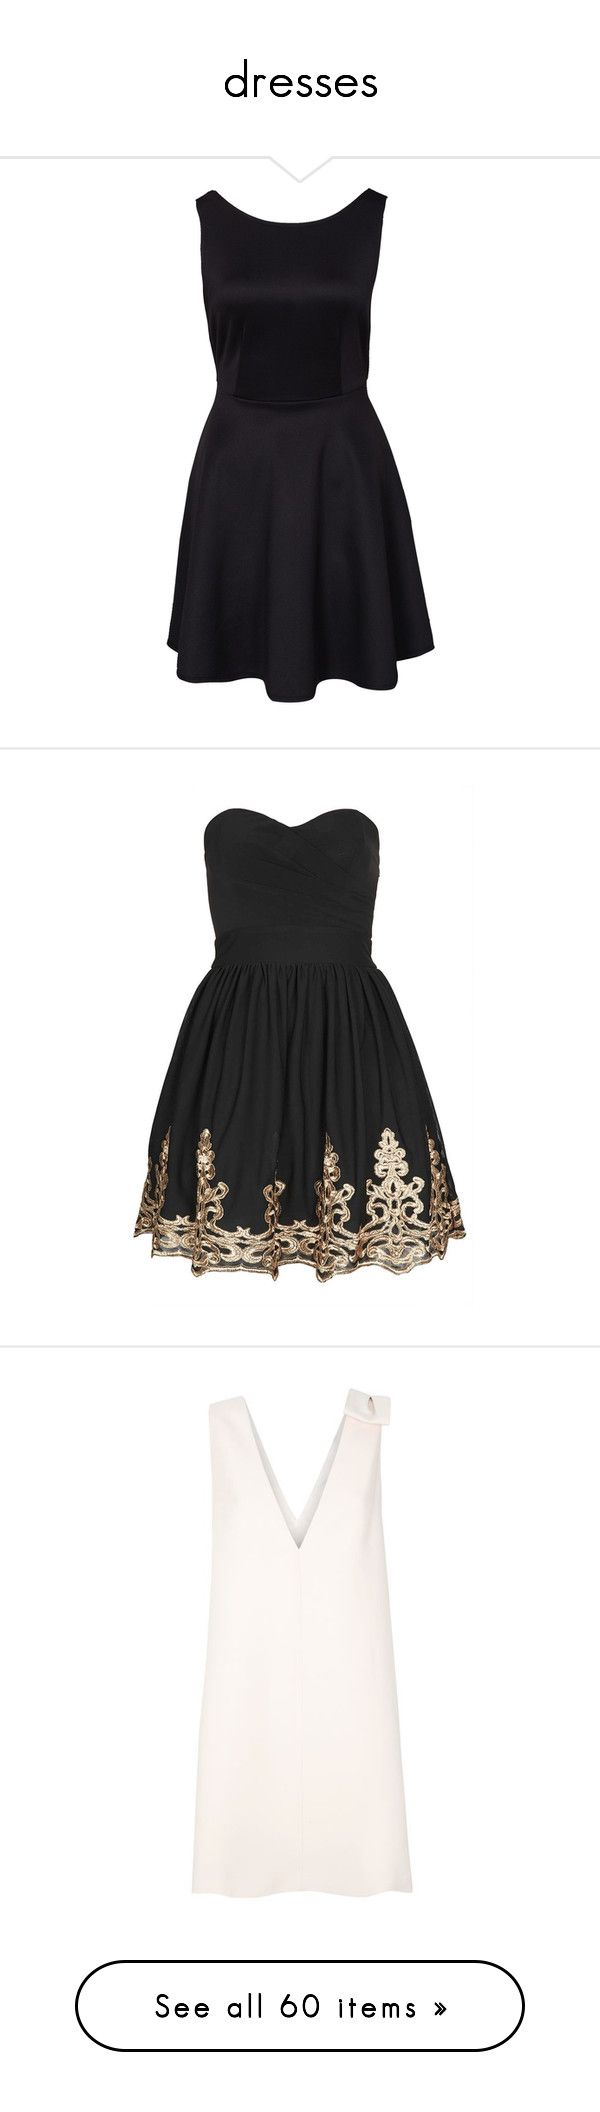 """dresses"" by simran26 ❤ liked on Polyvore featuring dresses, vestidos, black, party dresses, womens-fashion, tall skater dress, deep v neck skater dress, deep v neck black dress, tall dresses and low v neck dress"